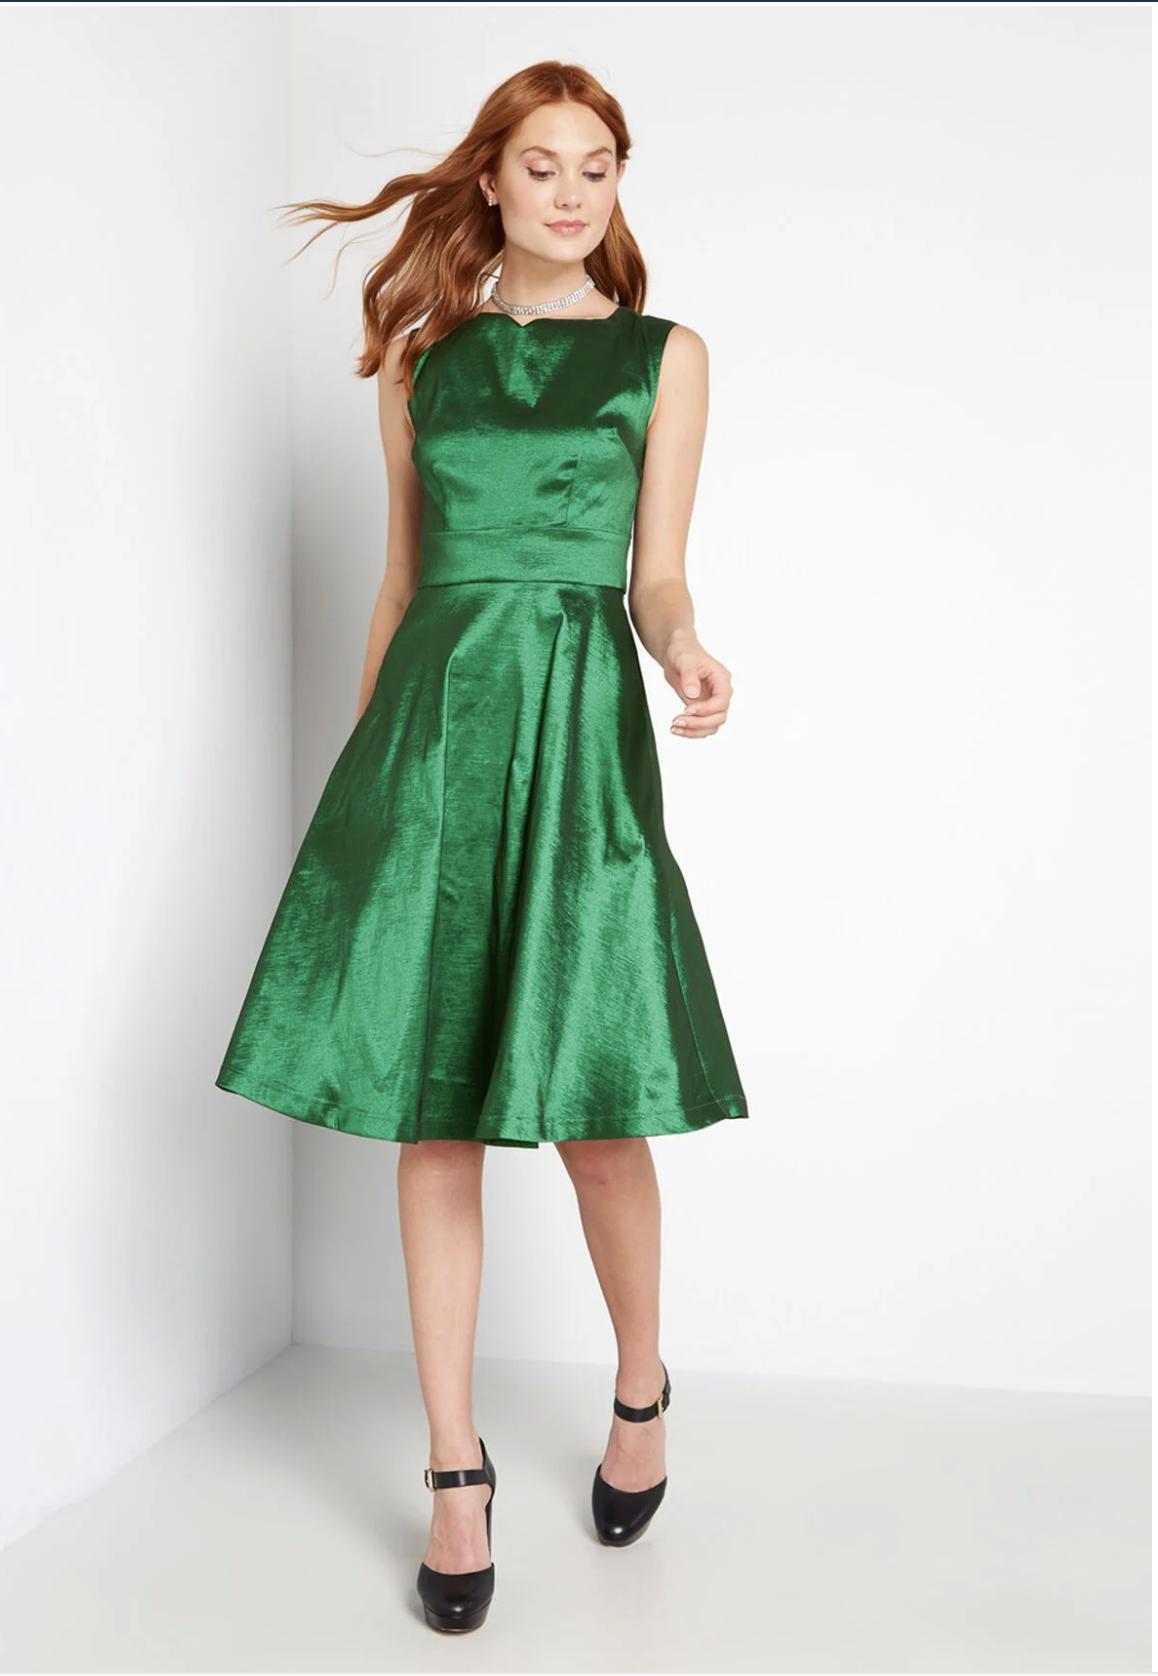 Model in sleeveless A-line green satin midi dress